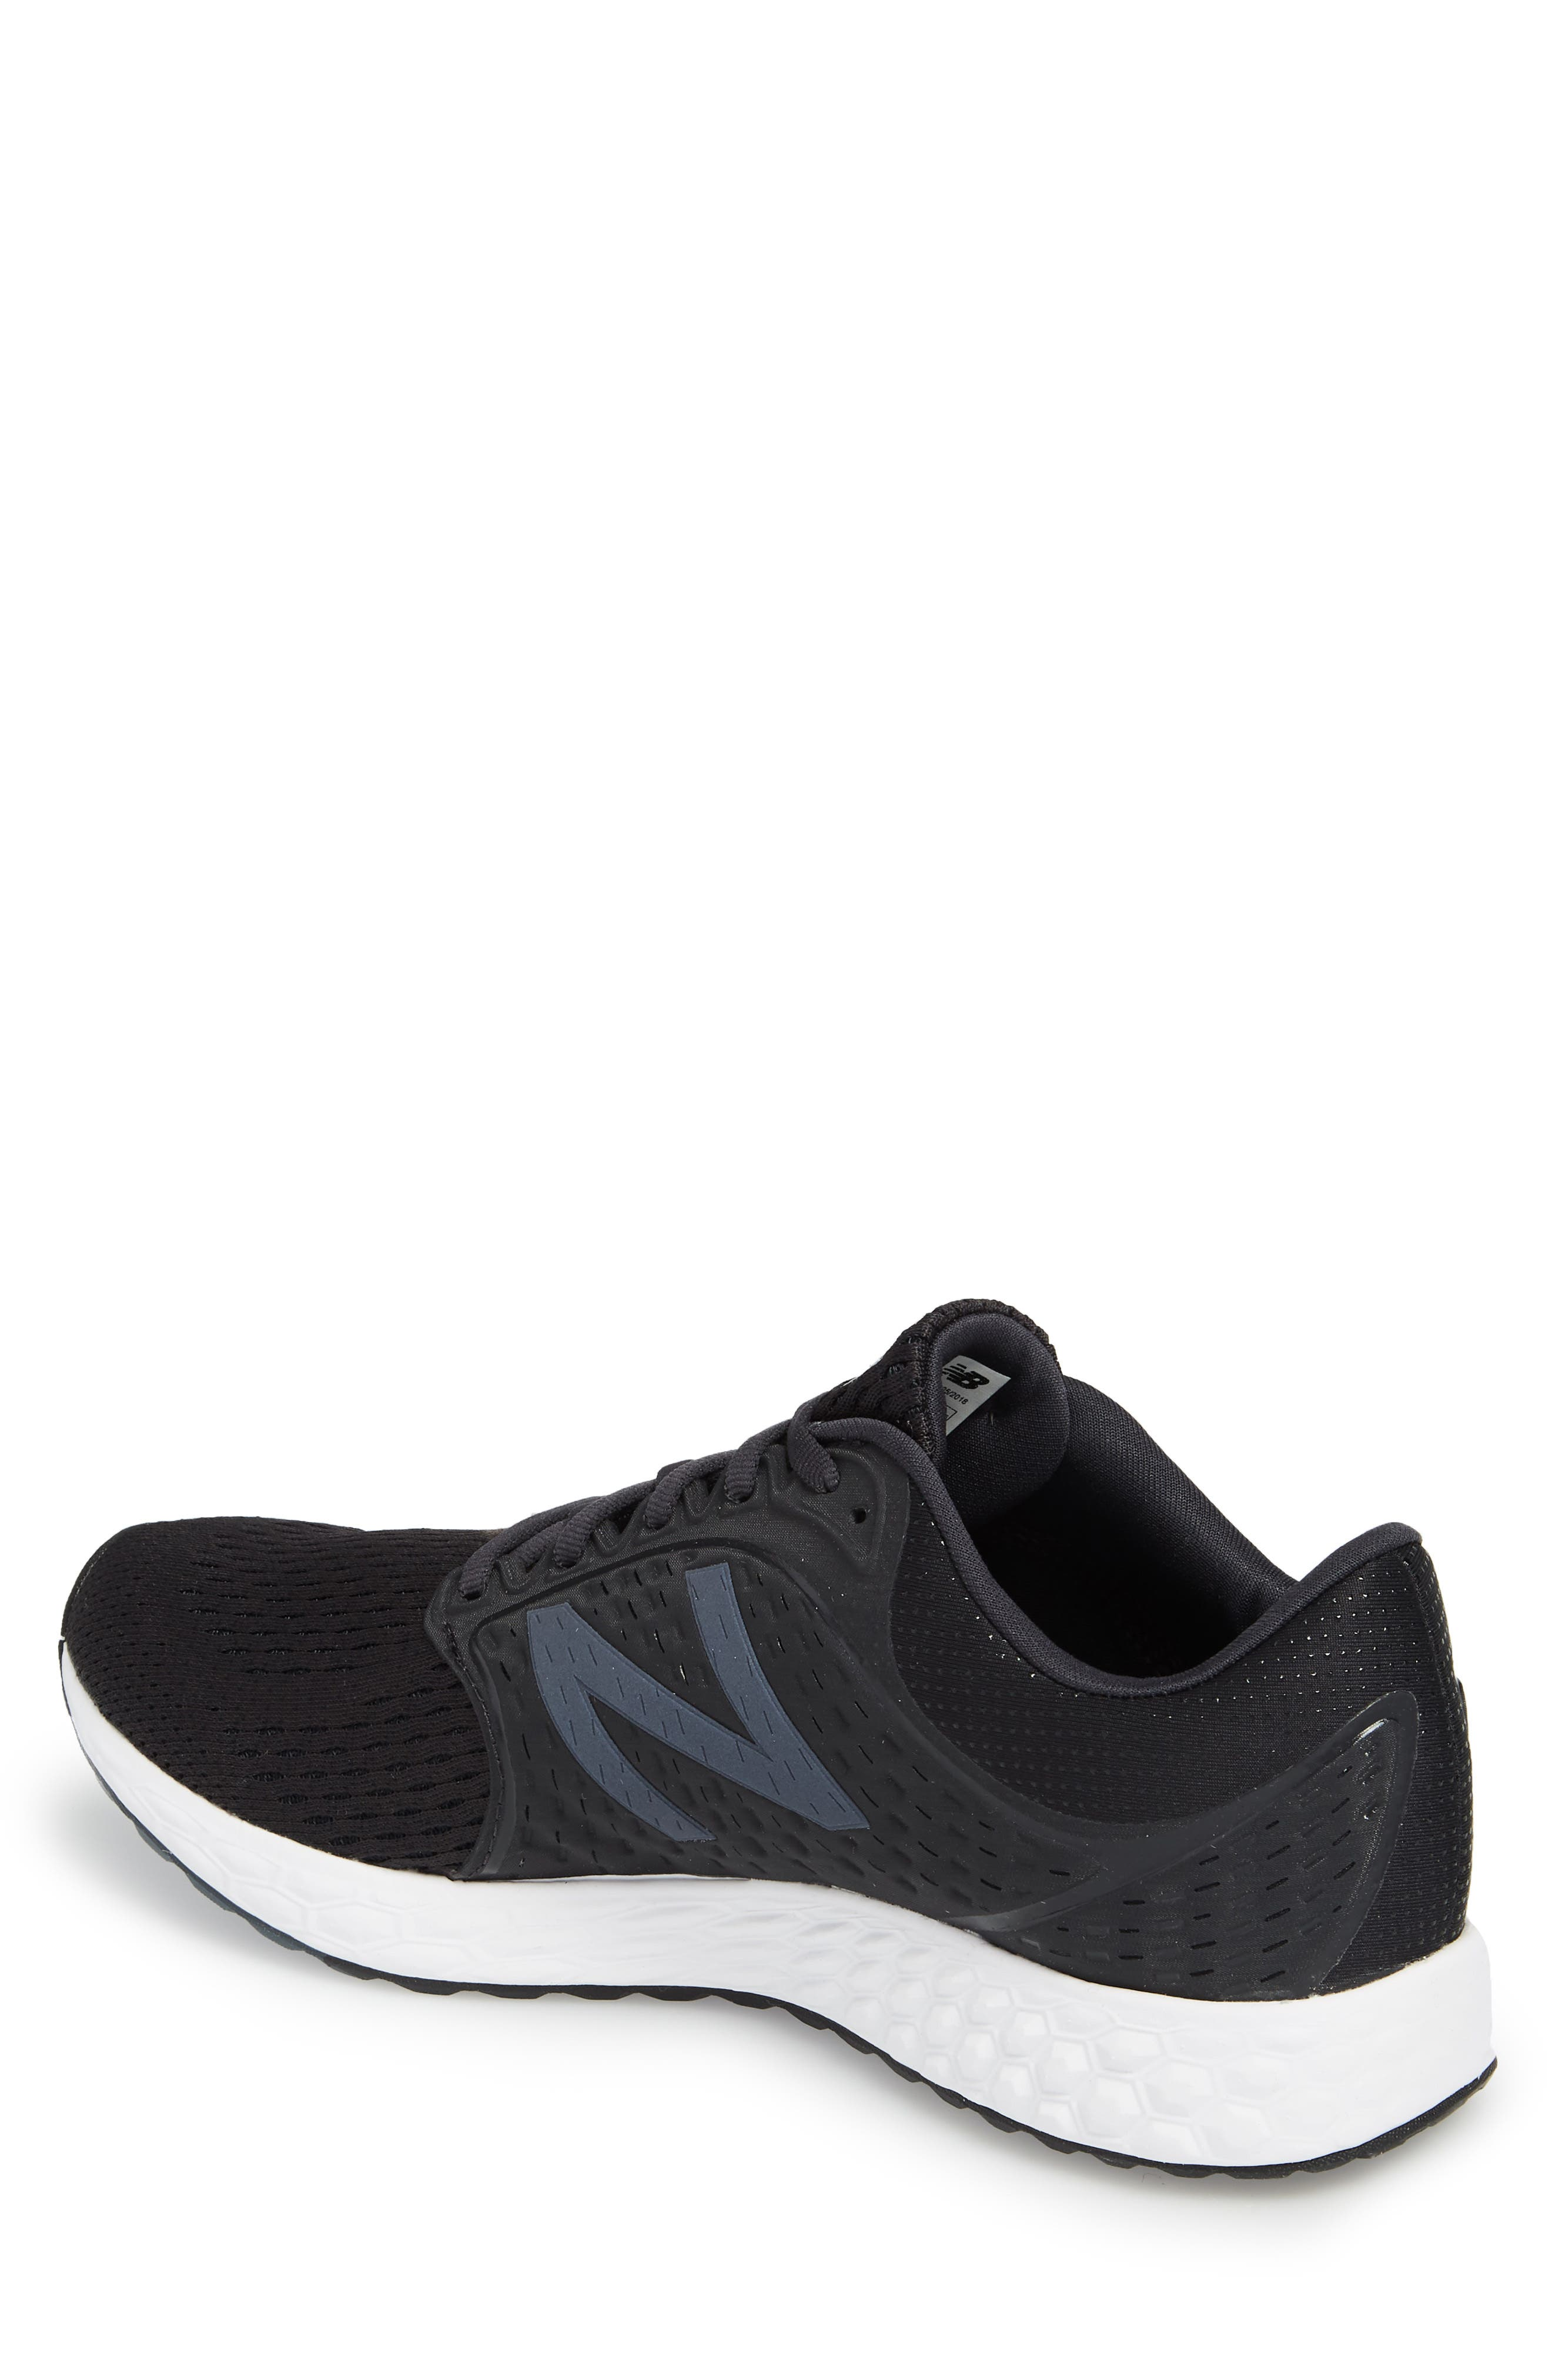 Fresh Foam Zante v4 Sneaker,                             Alternate thumbnail 2, color,                             Black